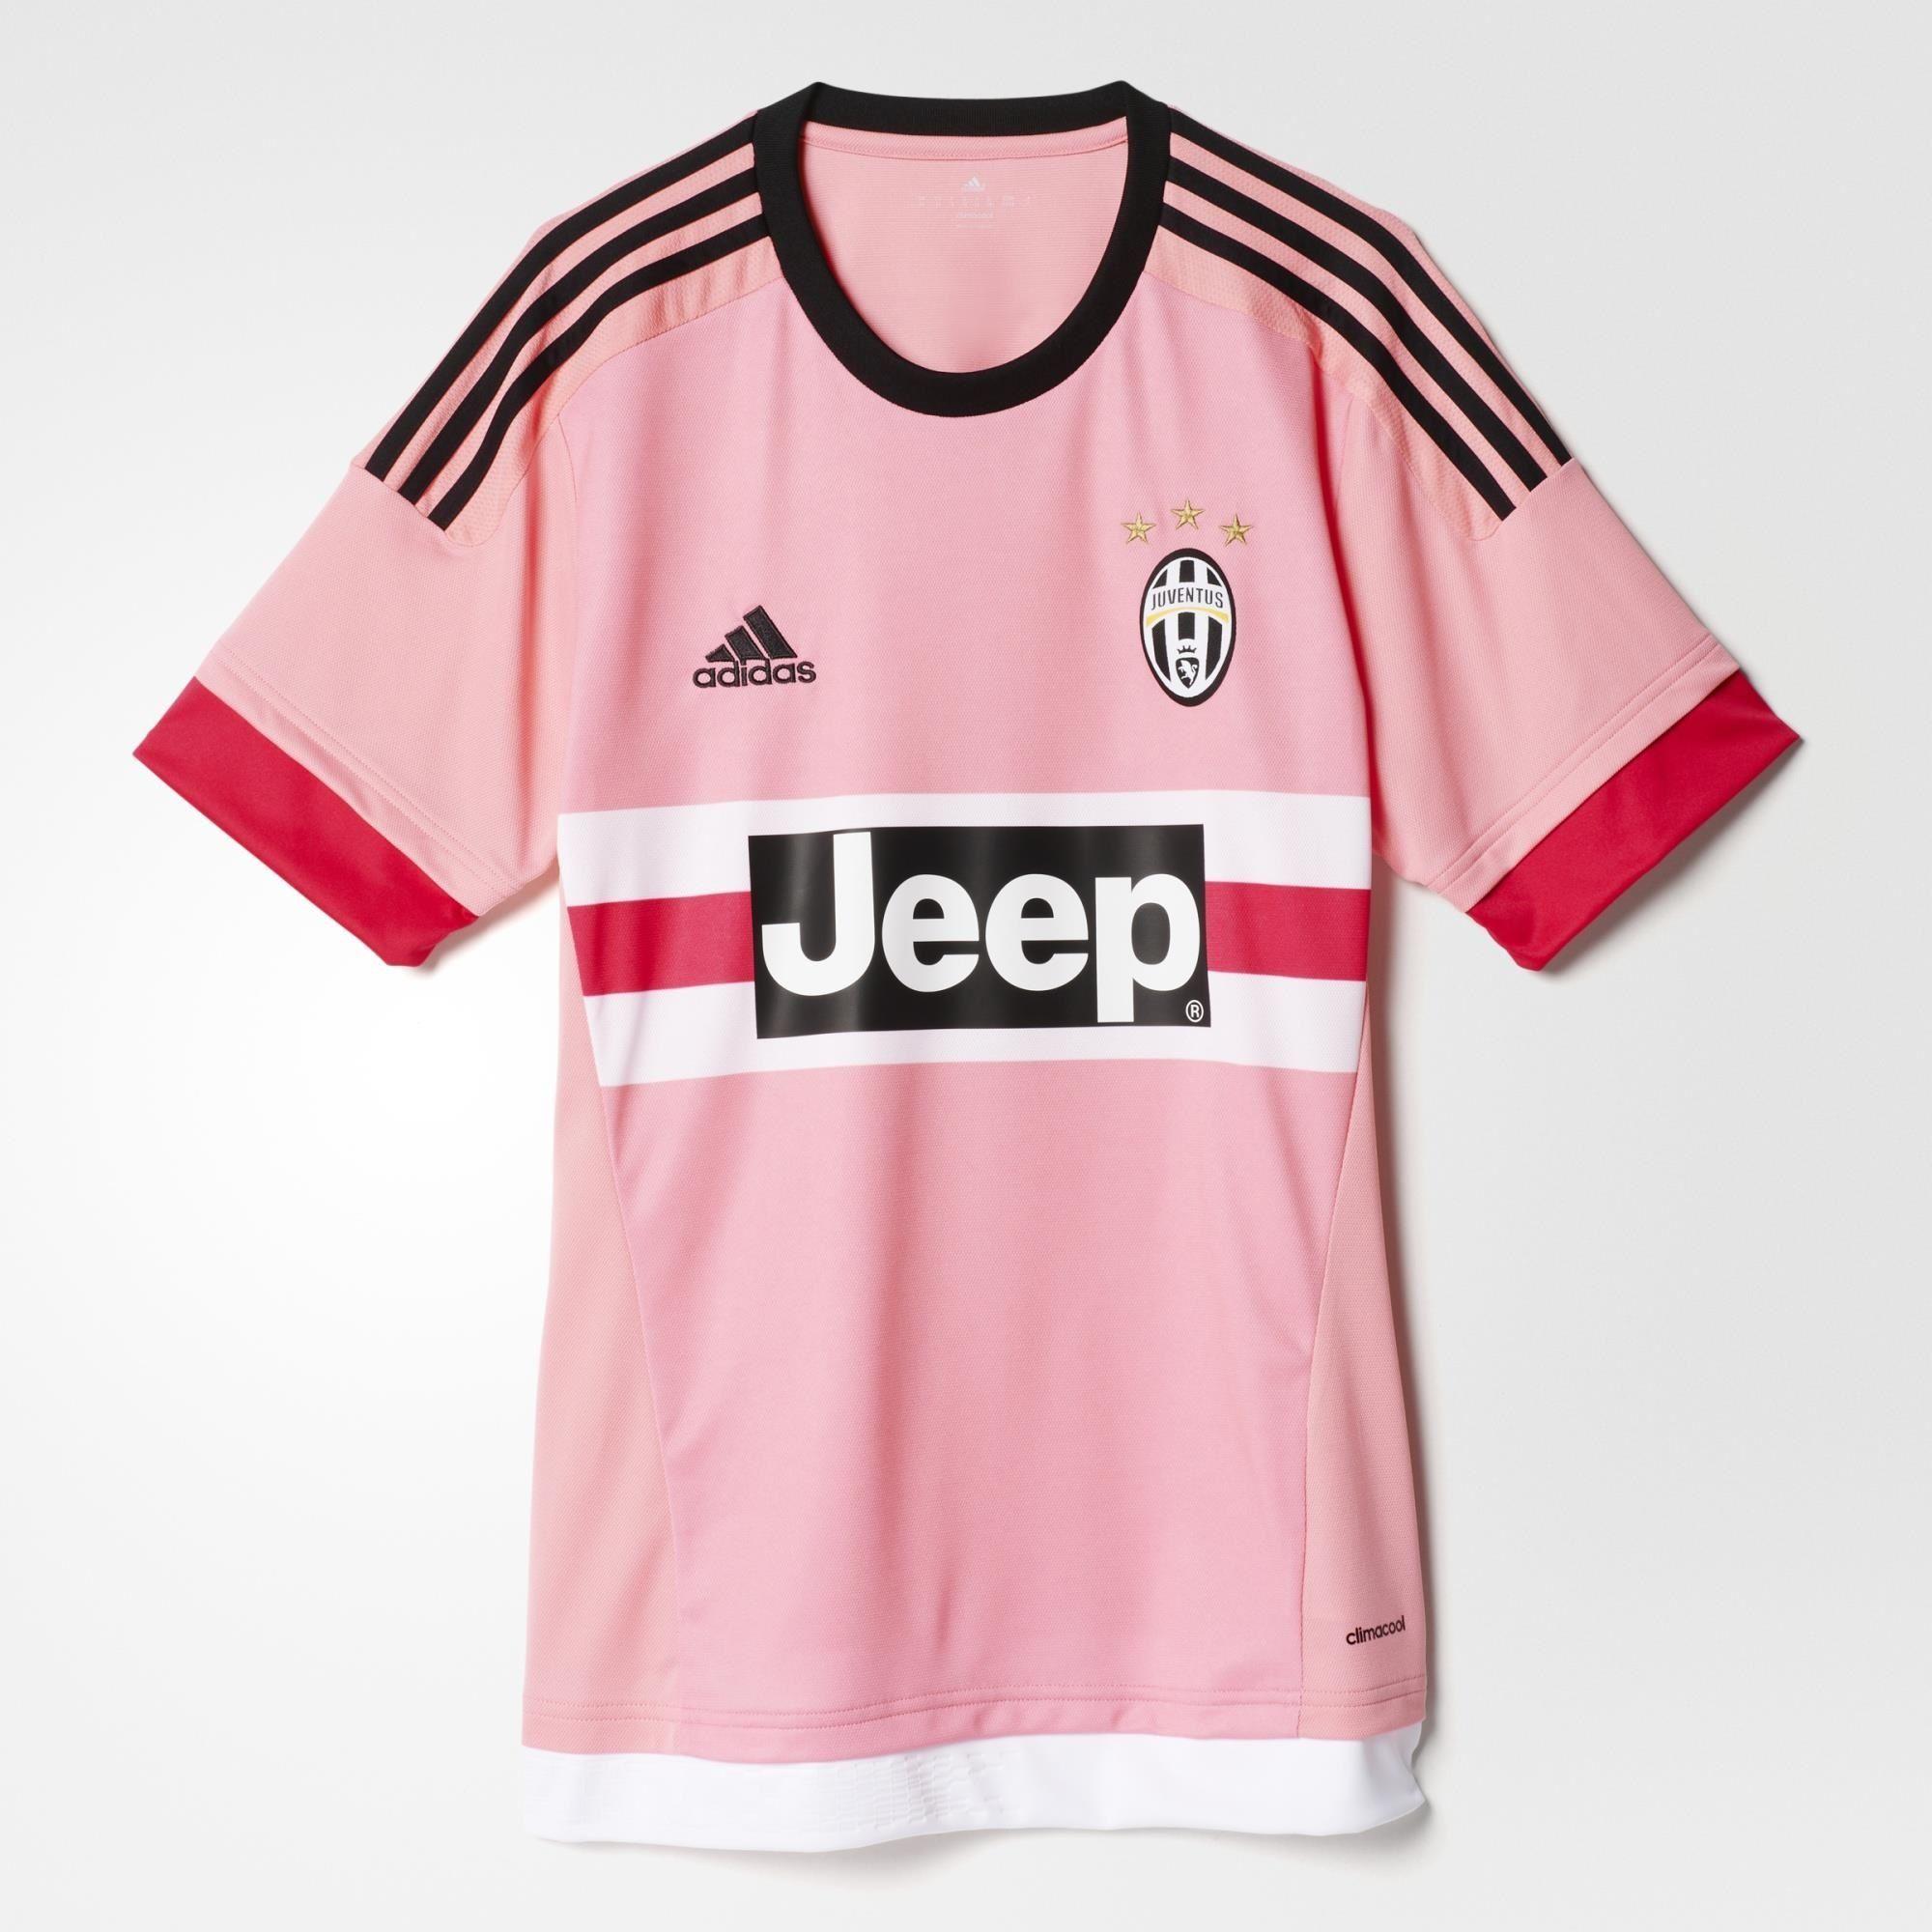 us men's soccer replica jersey